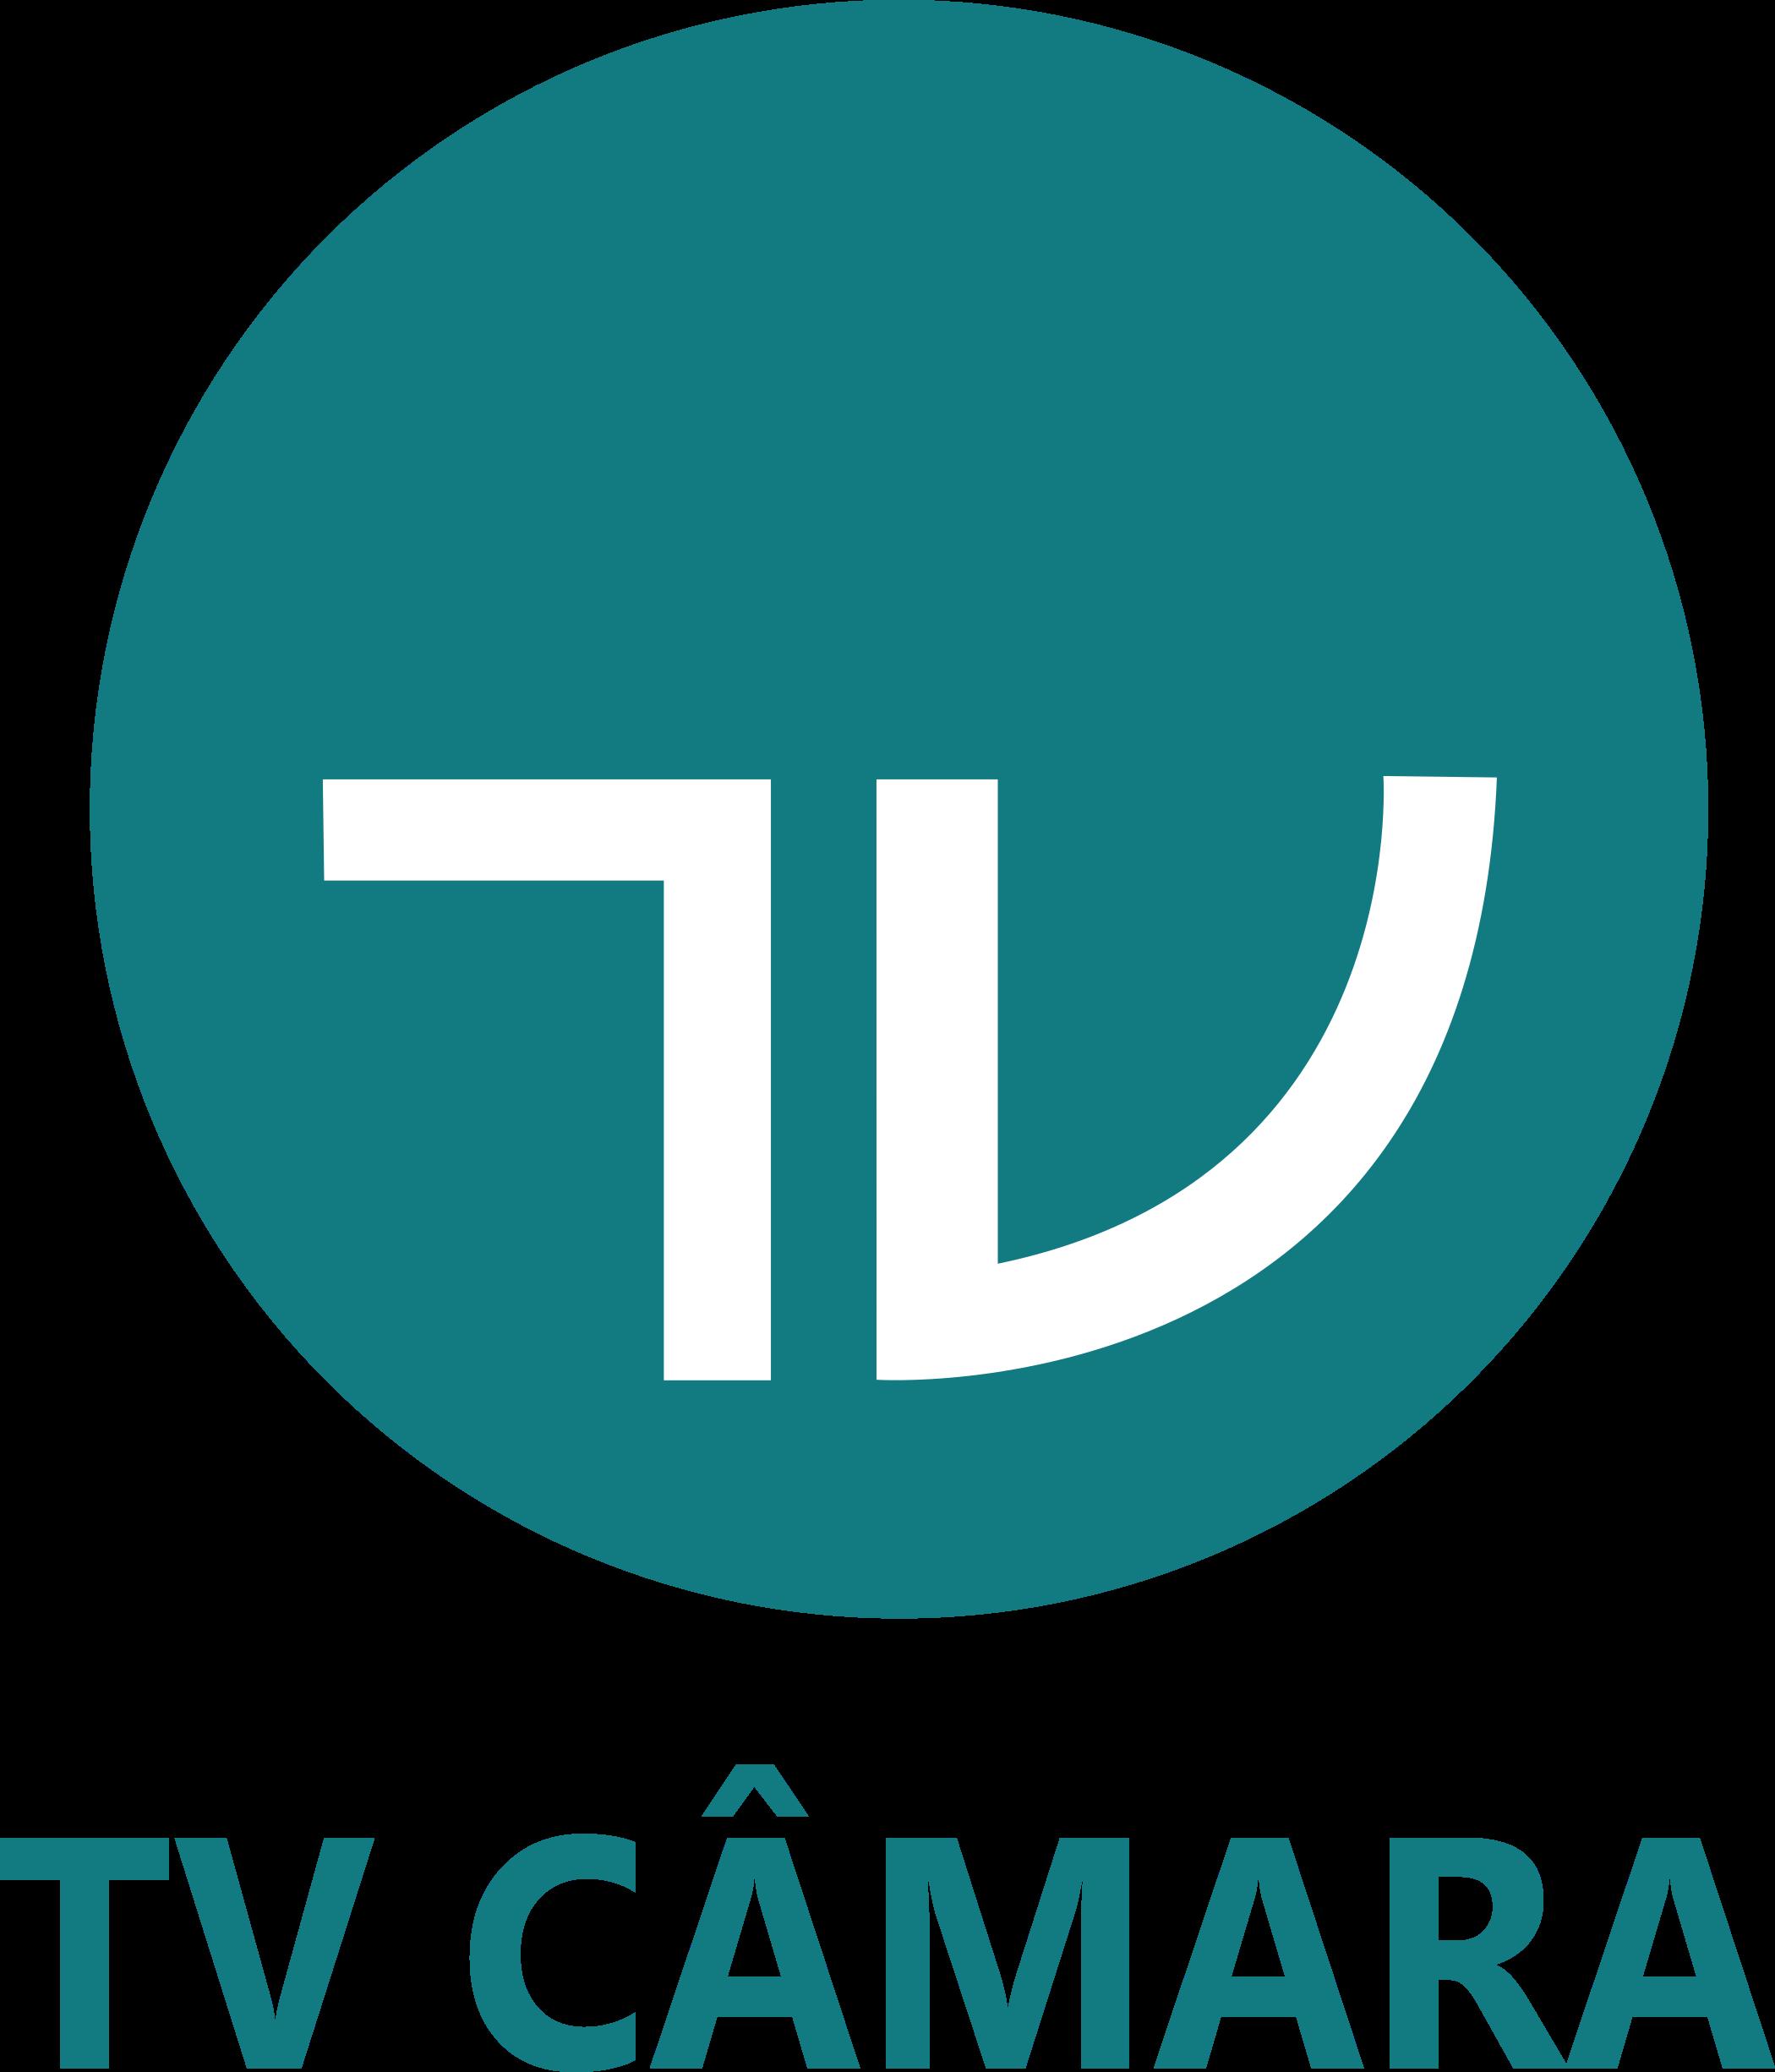 tv-camara-logo-1